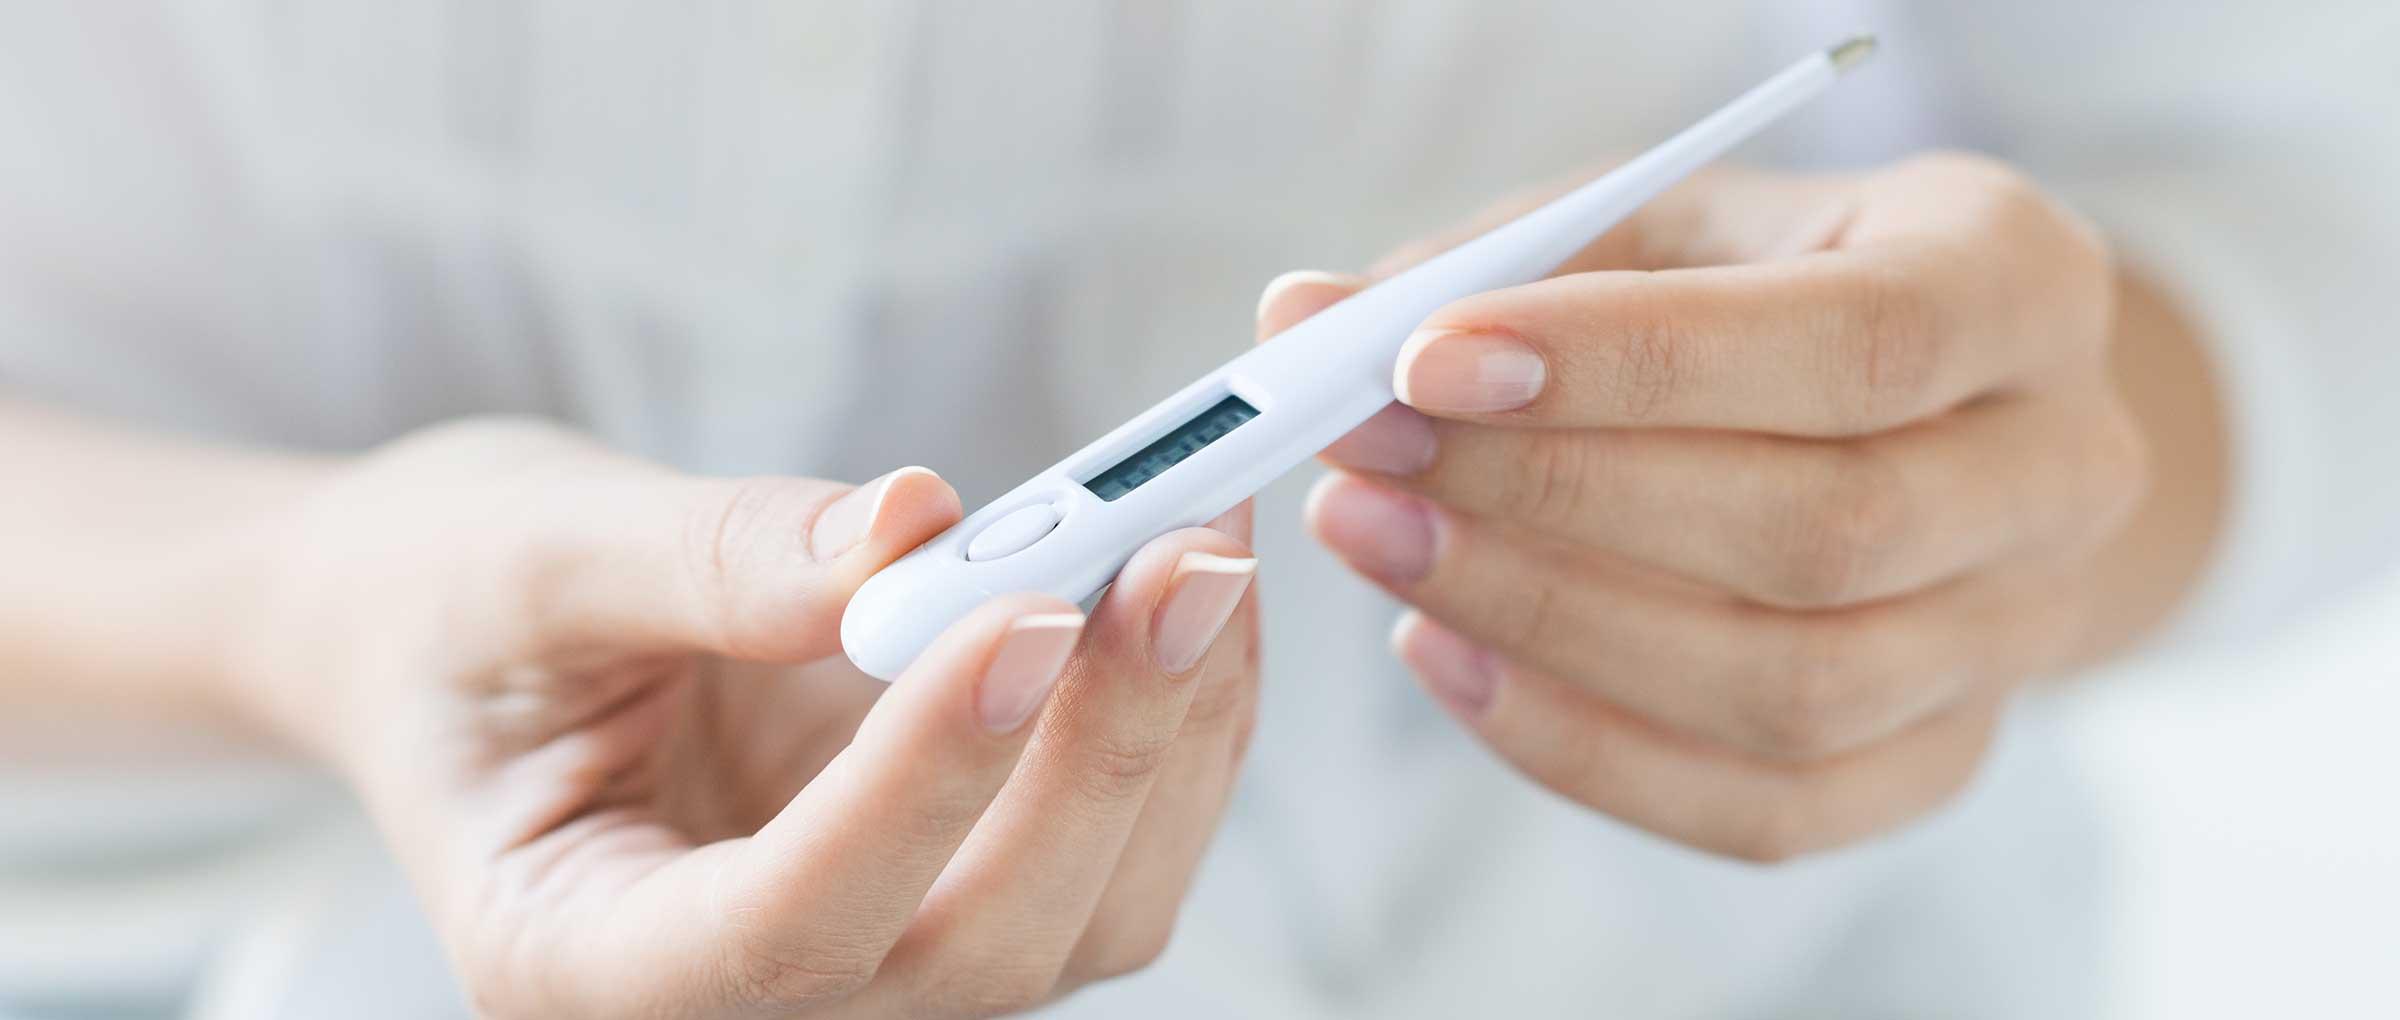 Température basale et grossesse